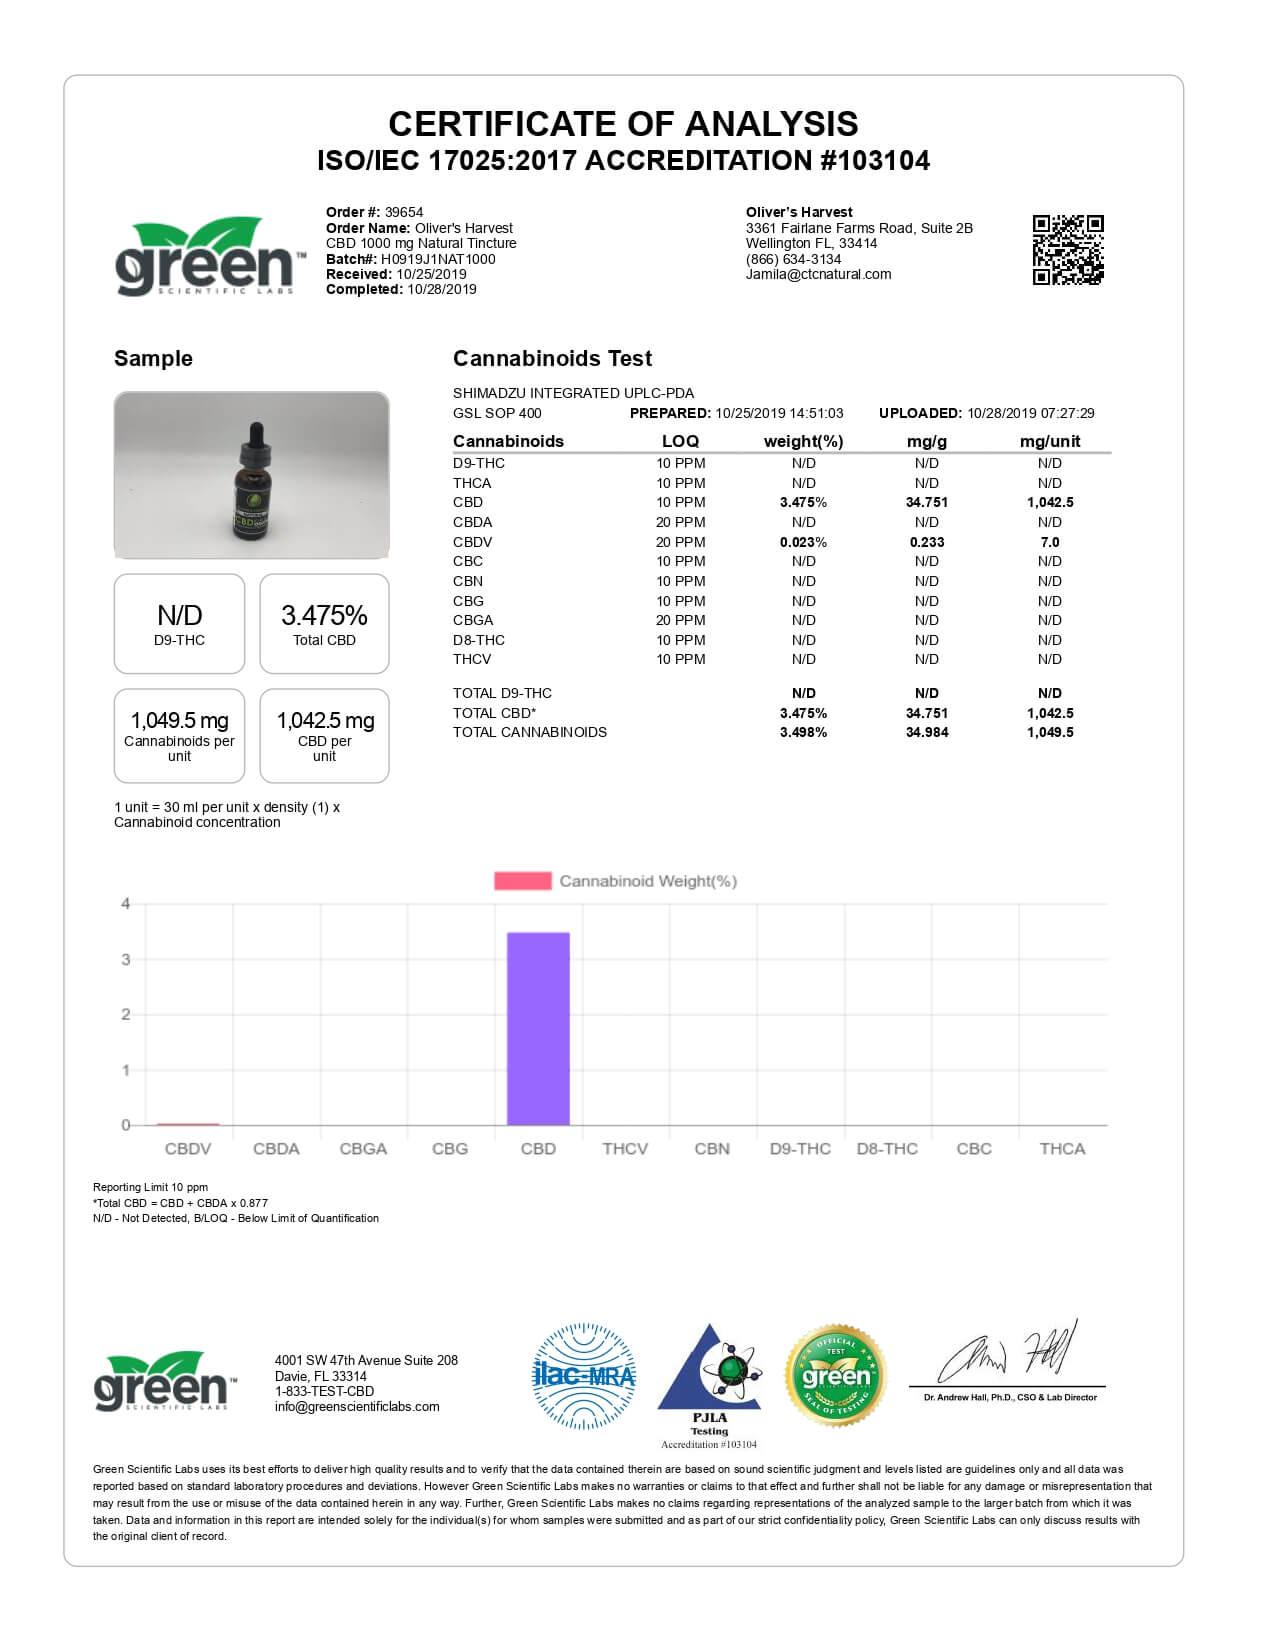 Oliver's Harvest CBD Tincture Broad Spectrum Natural Oil 1000mg Lab Report